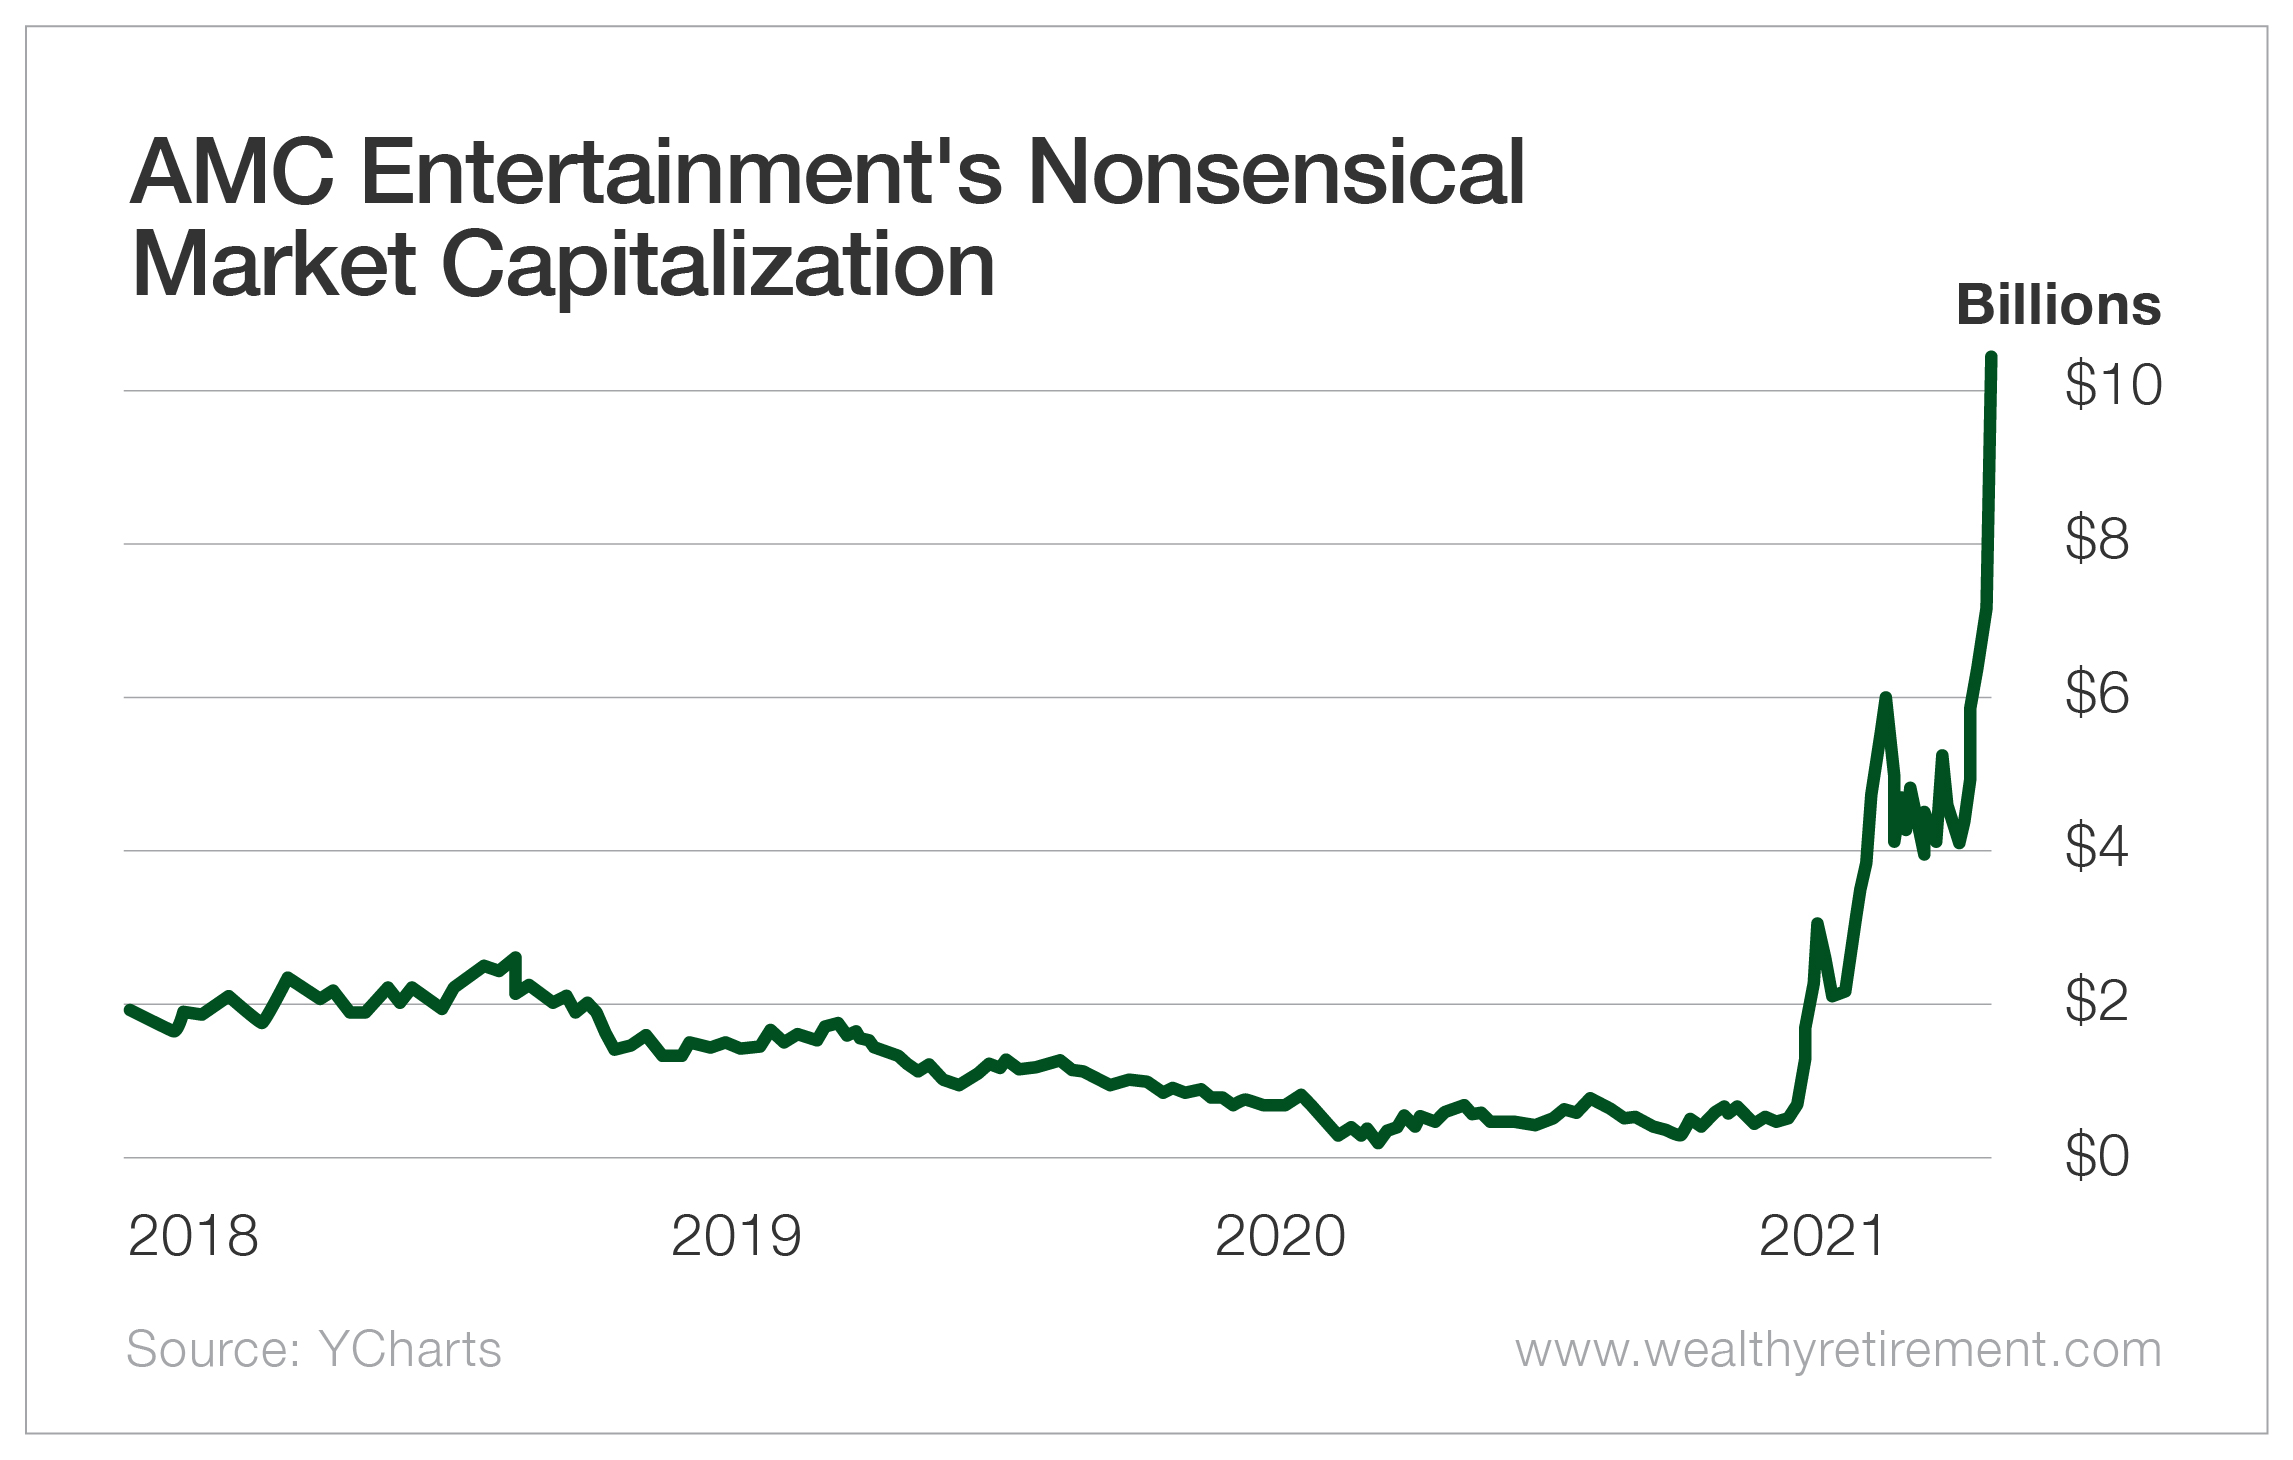 AMC Entertainment's Nonsensical Market Capitalization